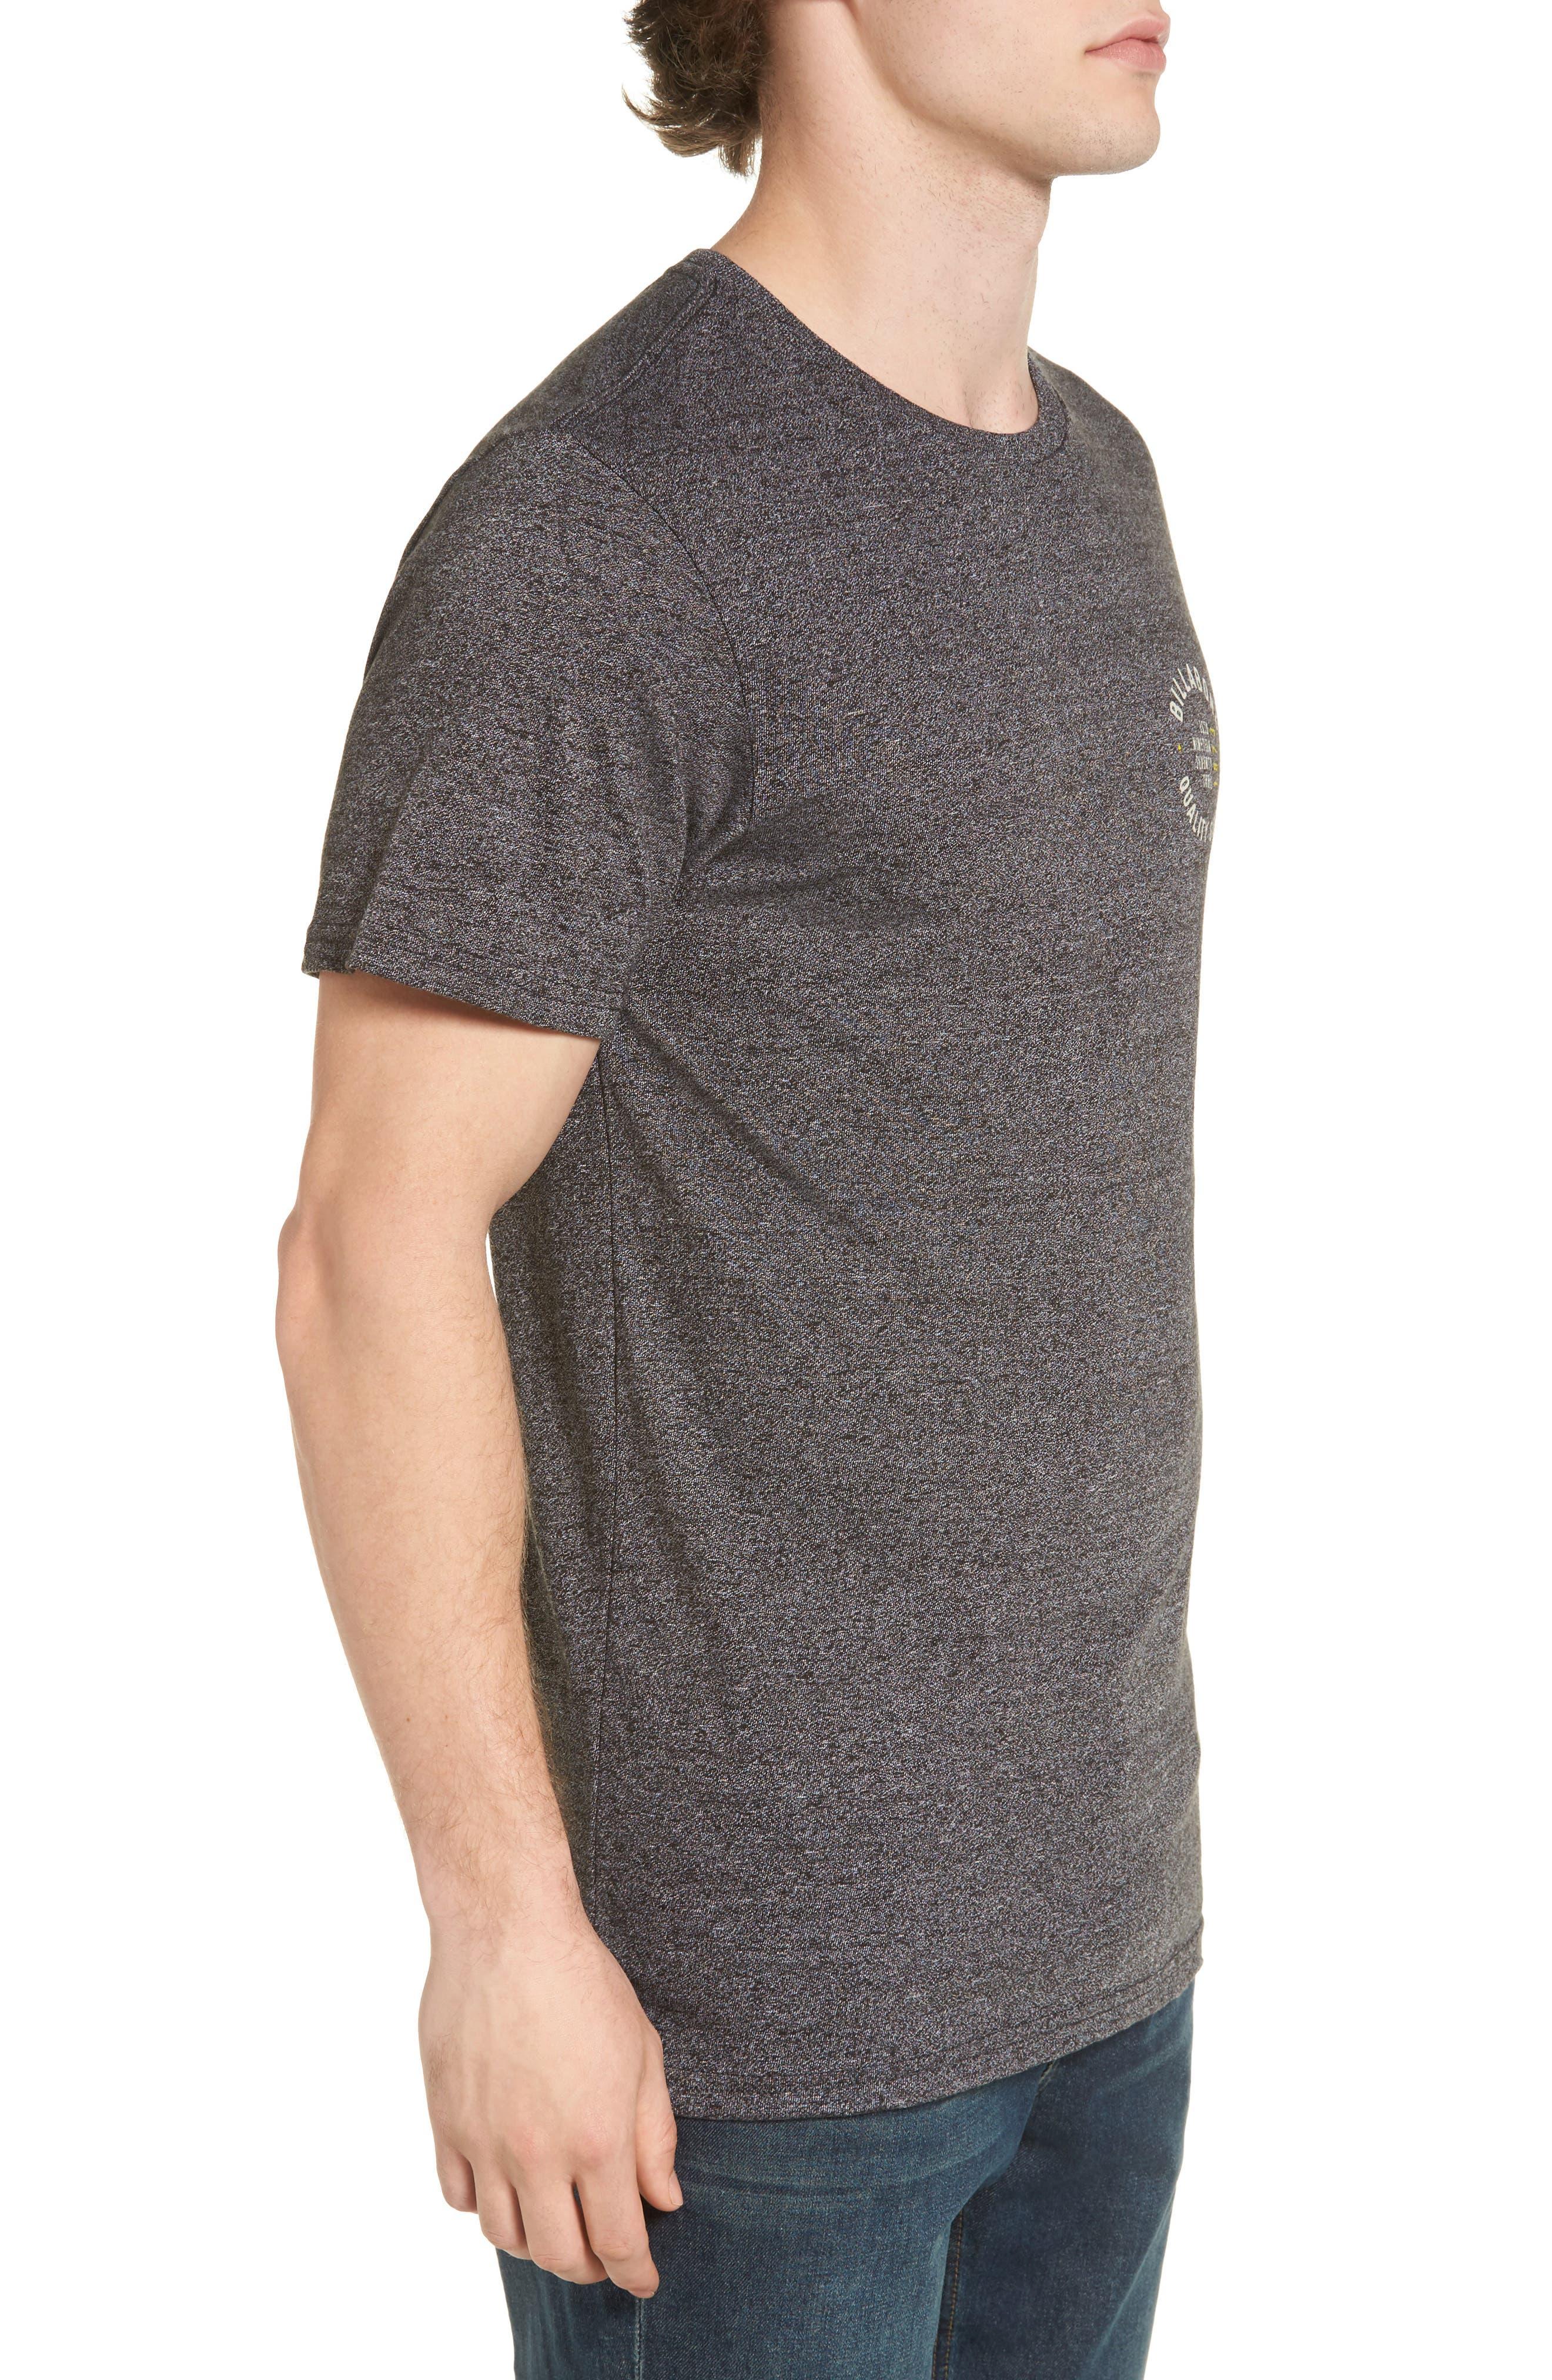 Wallace T-Shirt,                             Alternate thumbnail 3, color,                             001